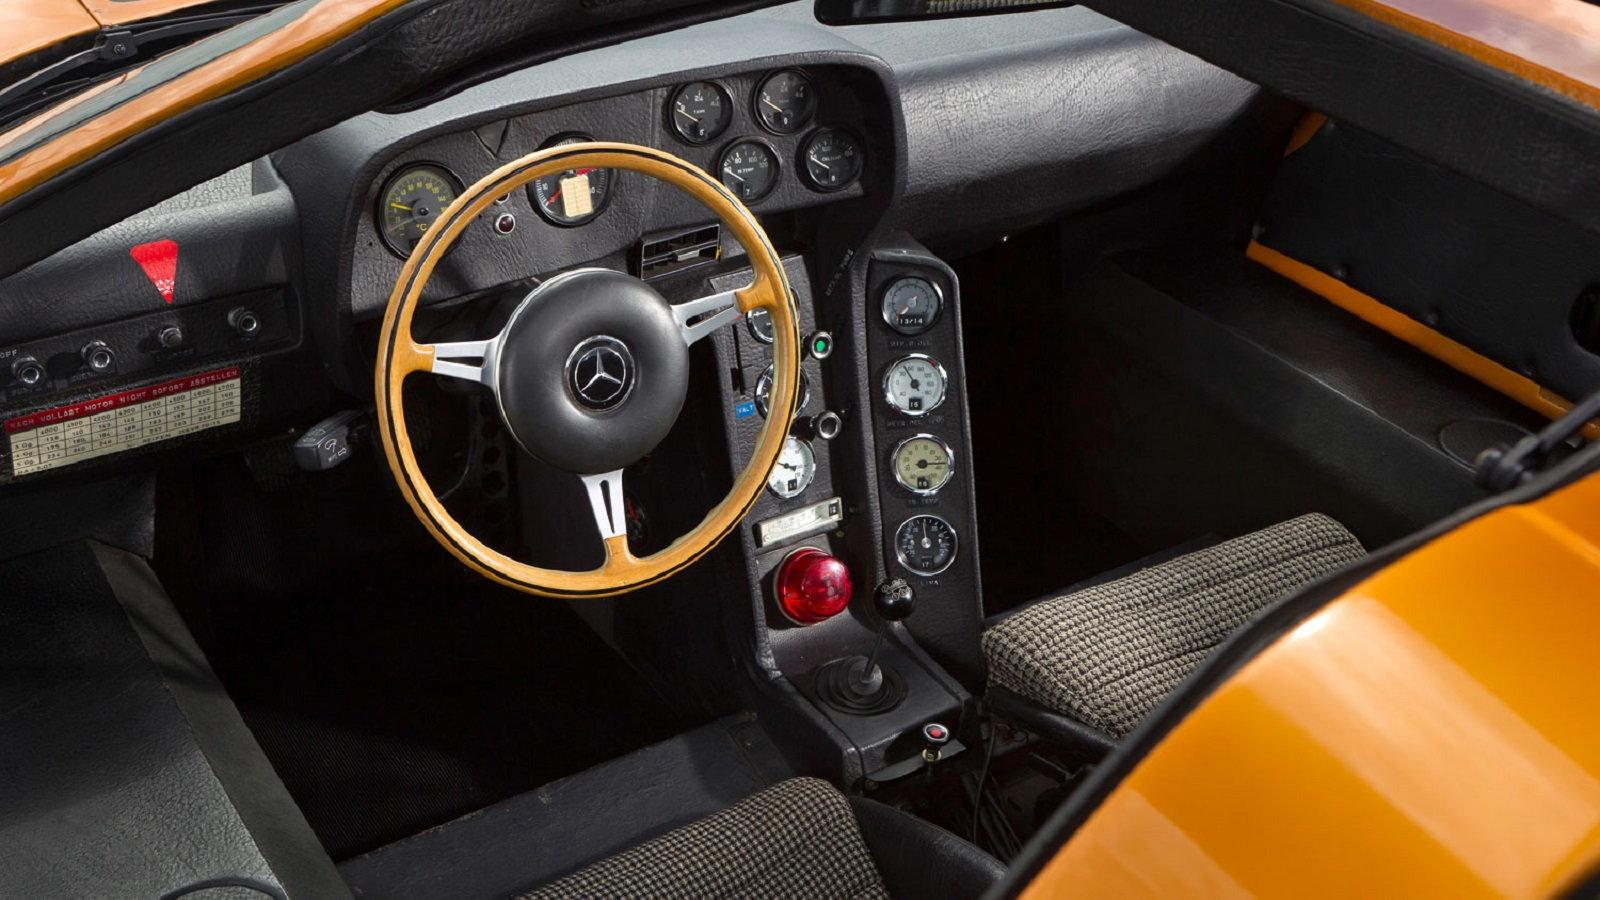 Mercedes C111 Concept Appears Again at Frankfurt Motor Show